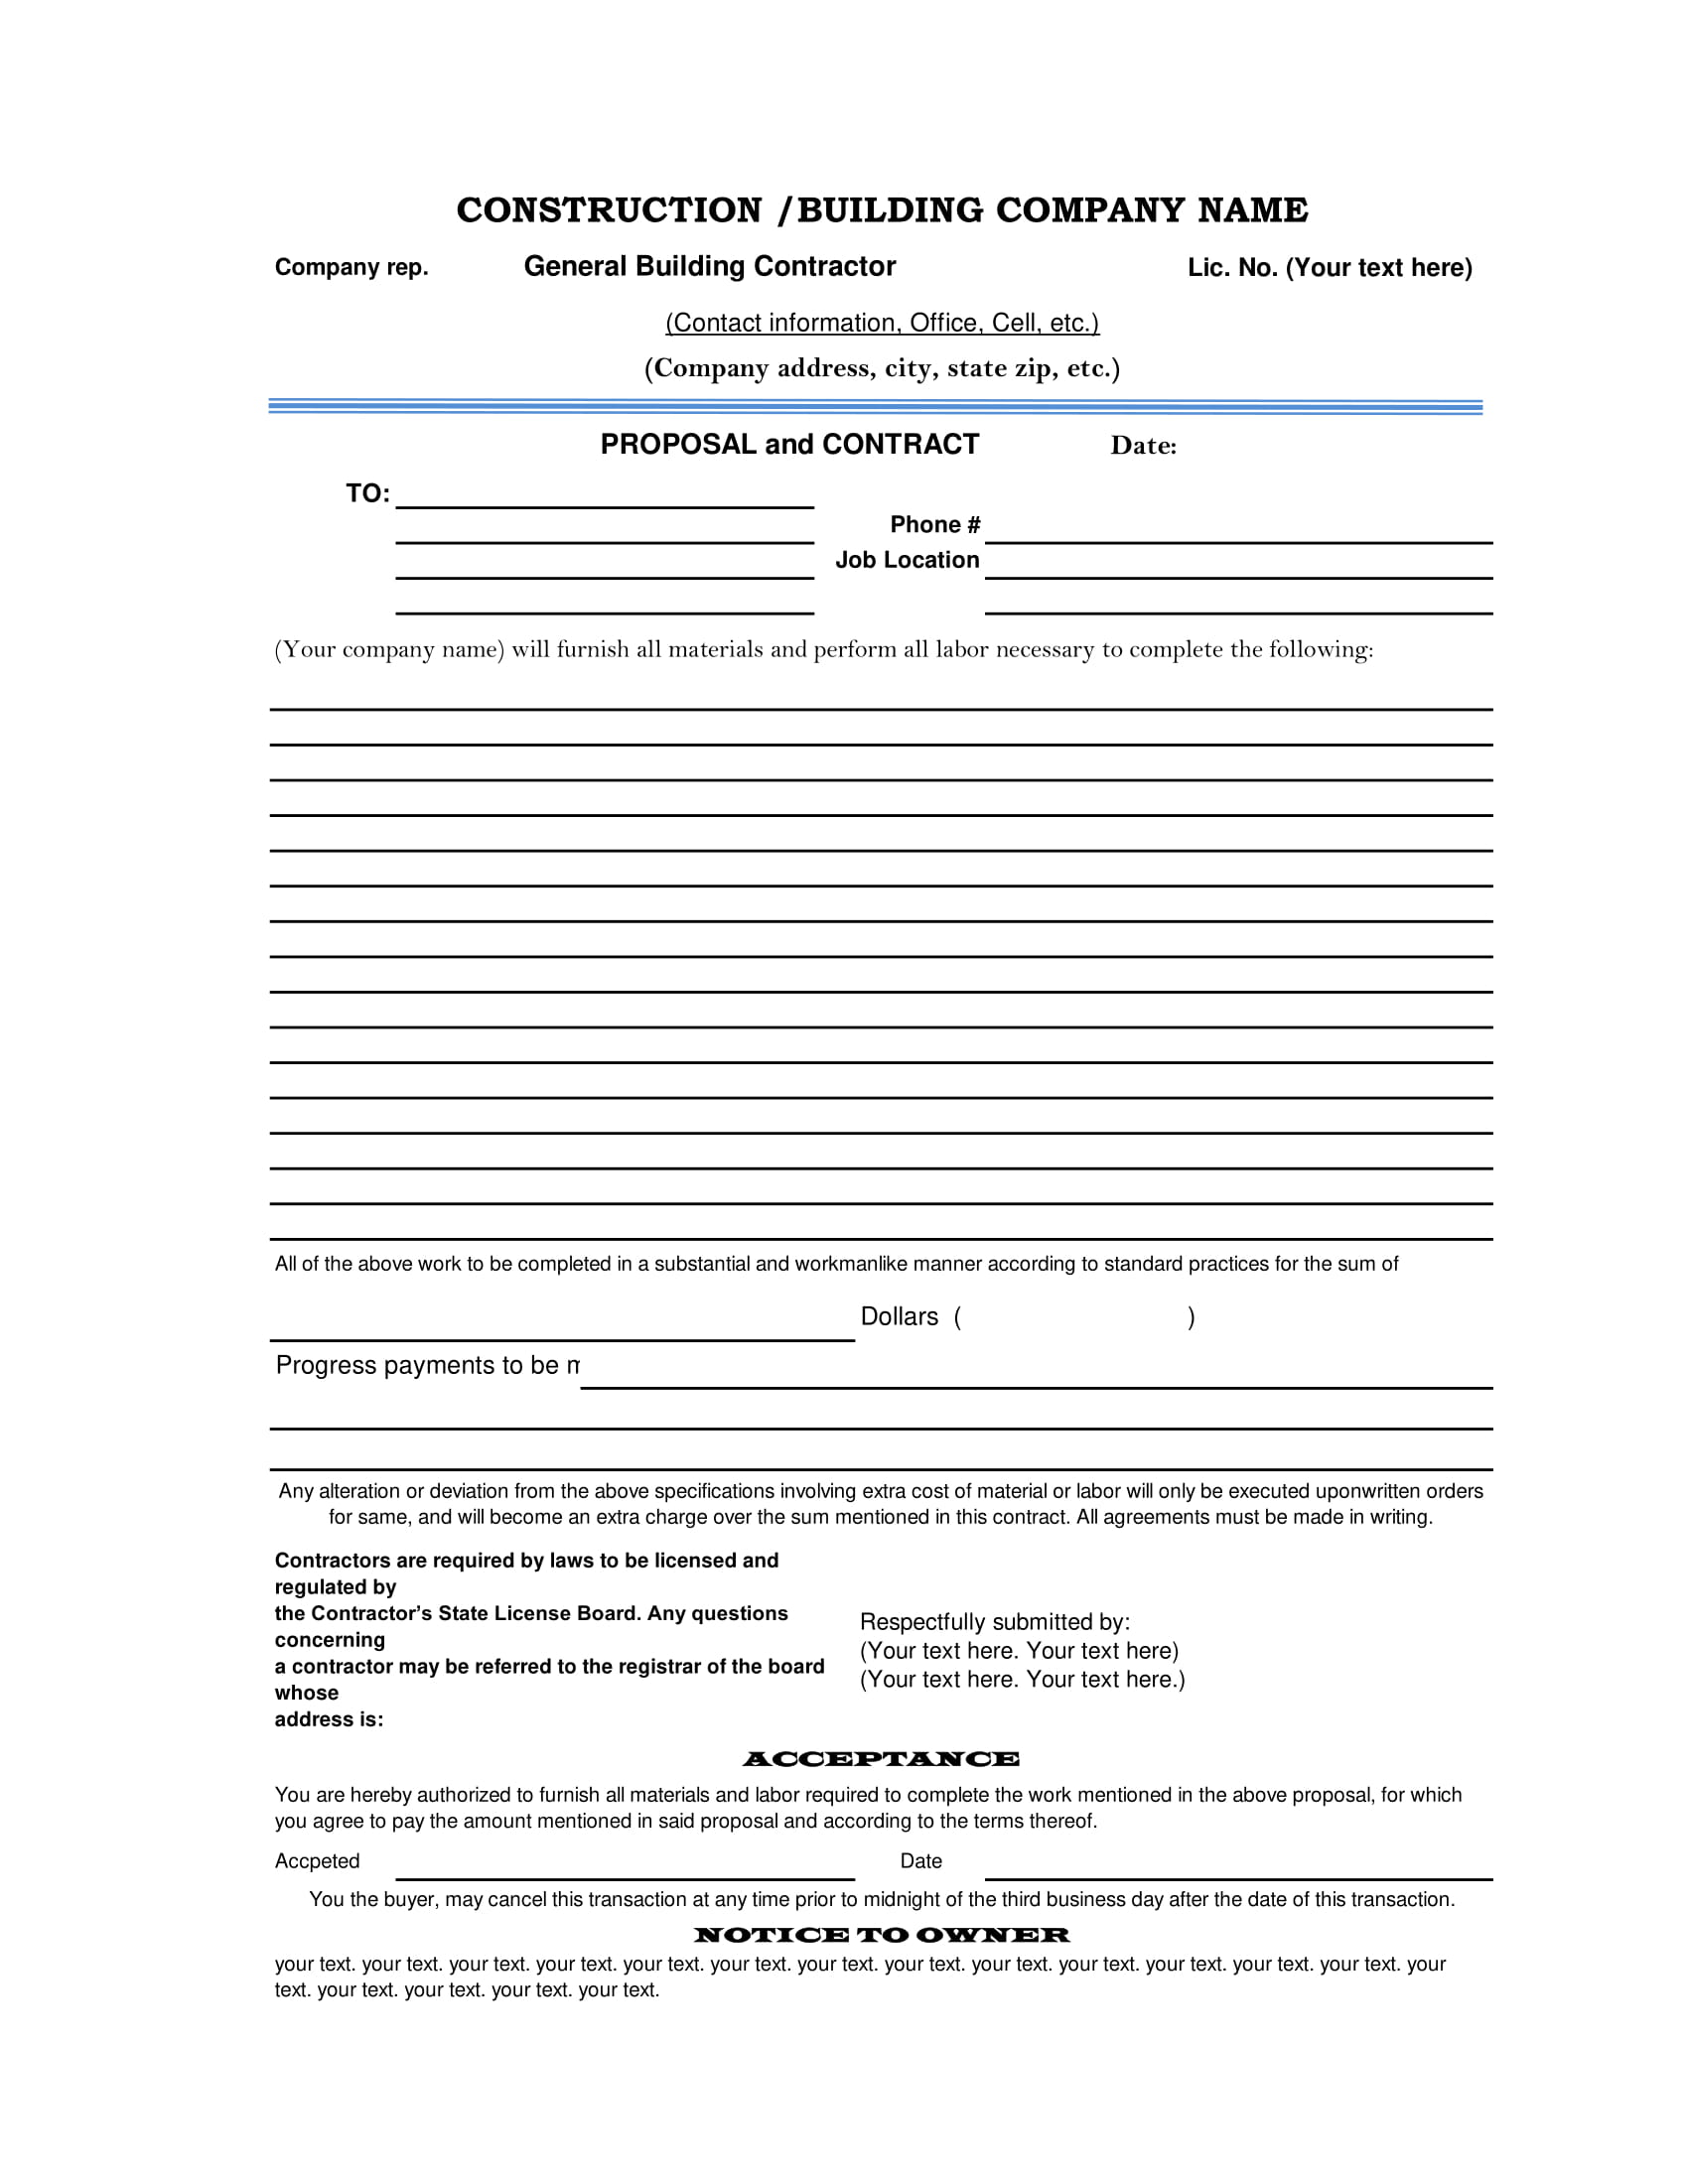 construction proposal form sample 2